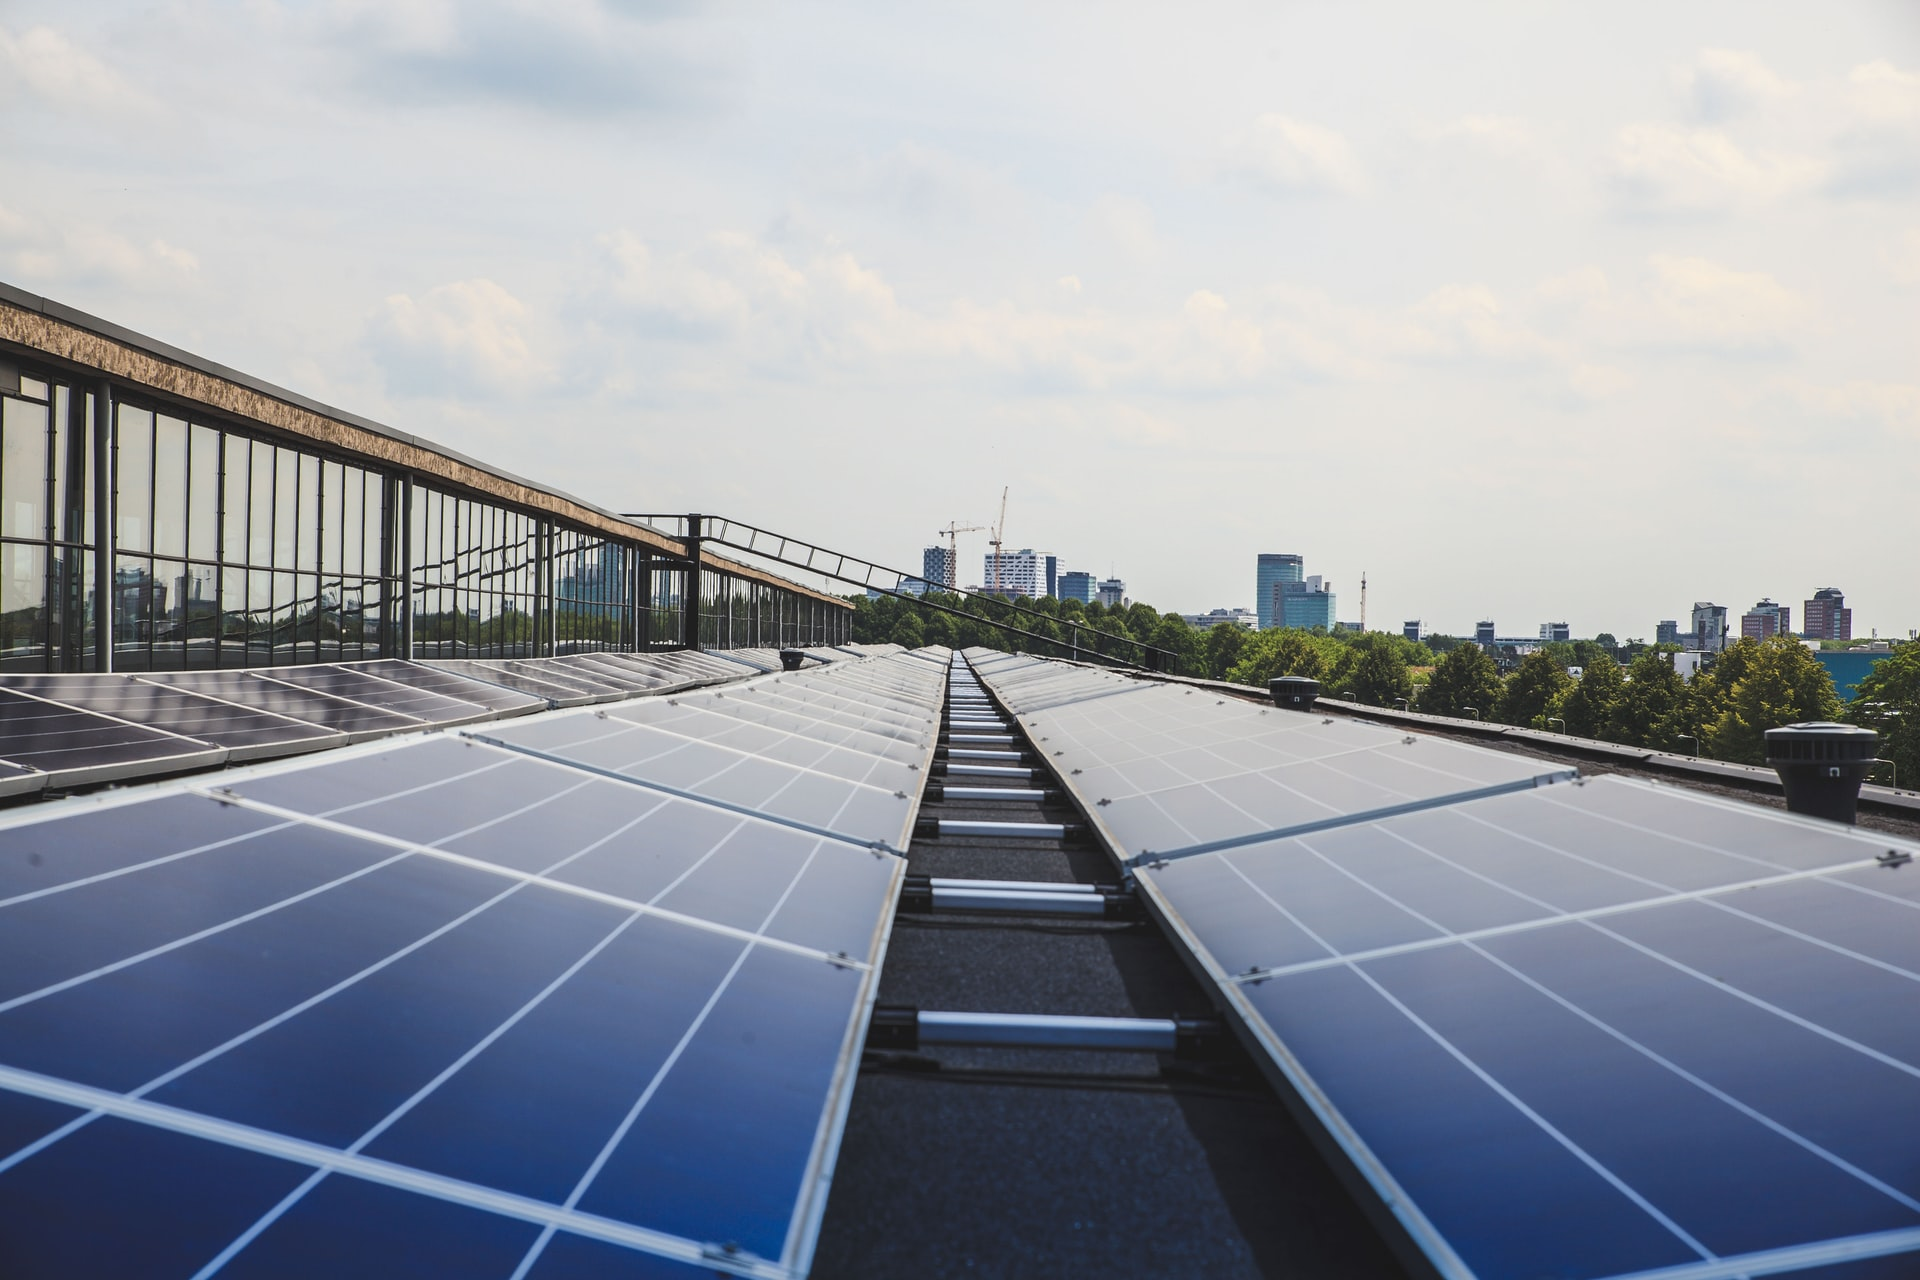 Conheça 6 vantagens da energia solar